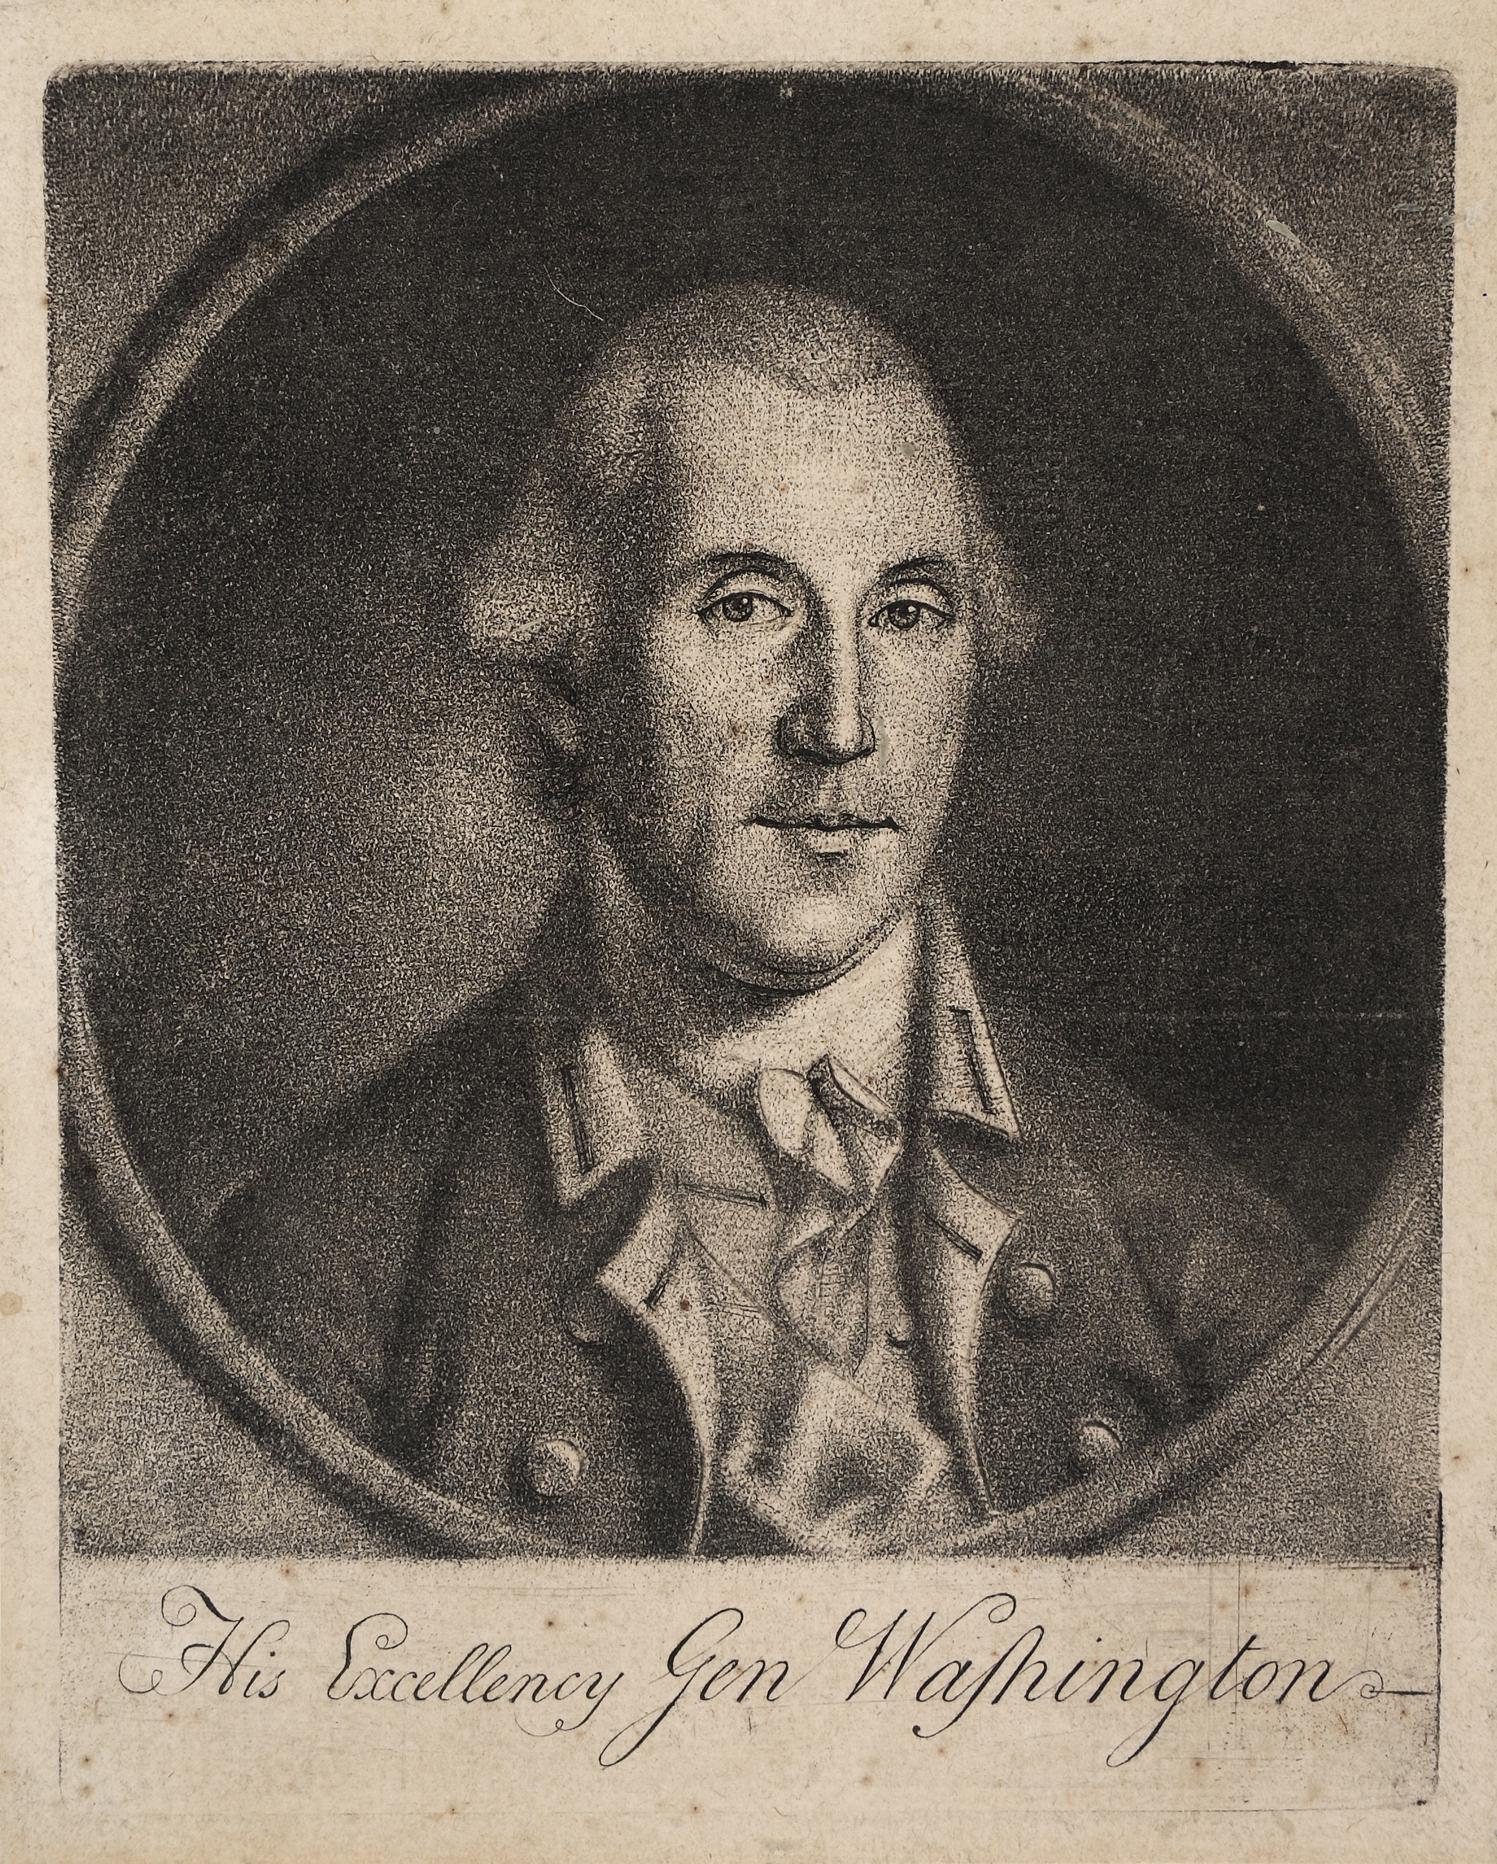 His Excellency Gen Washington, Charles Willison Peale, Philadelphia, 1778